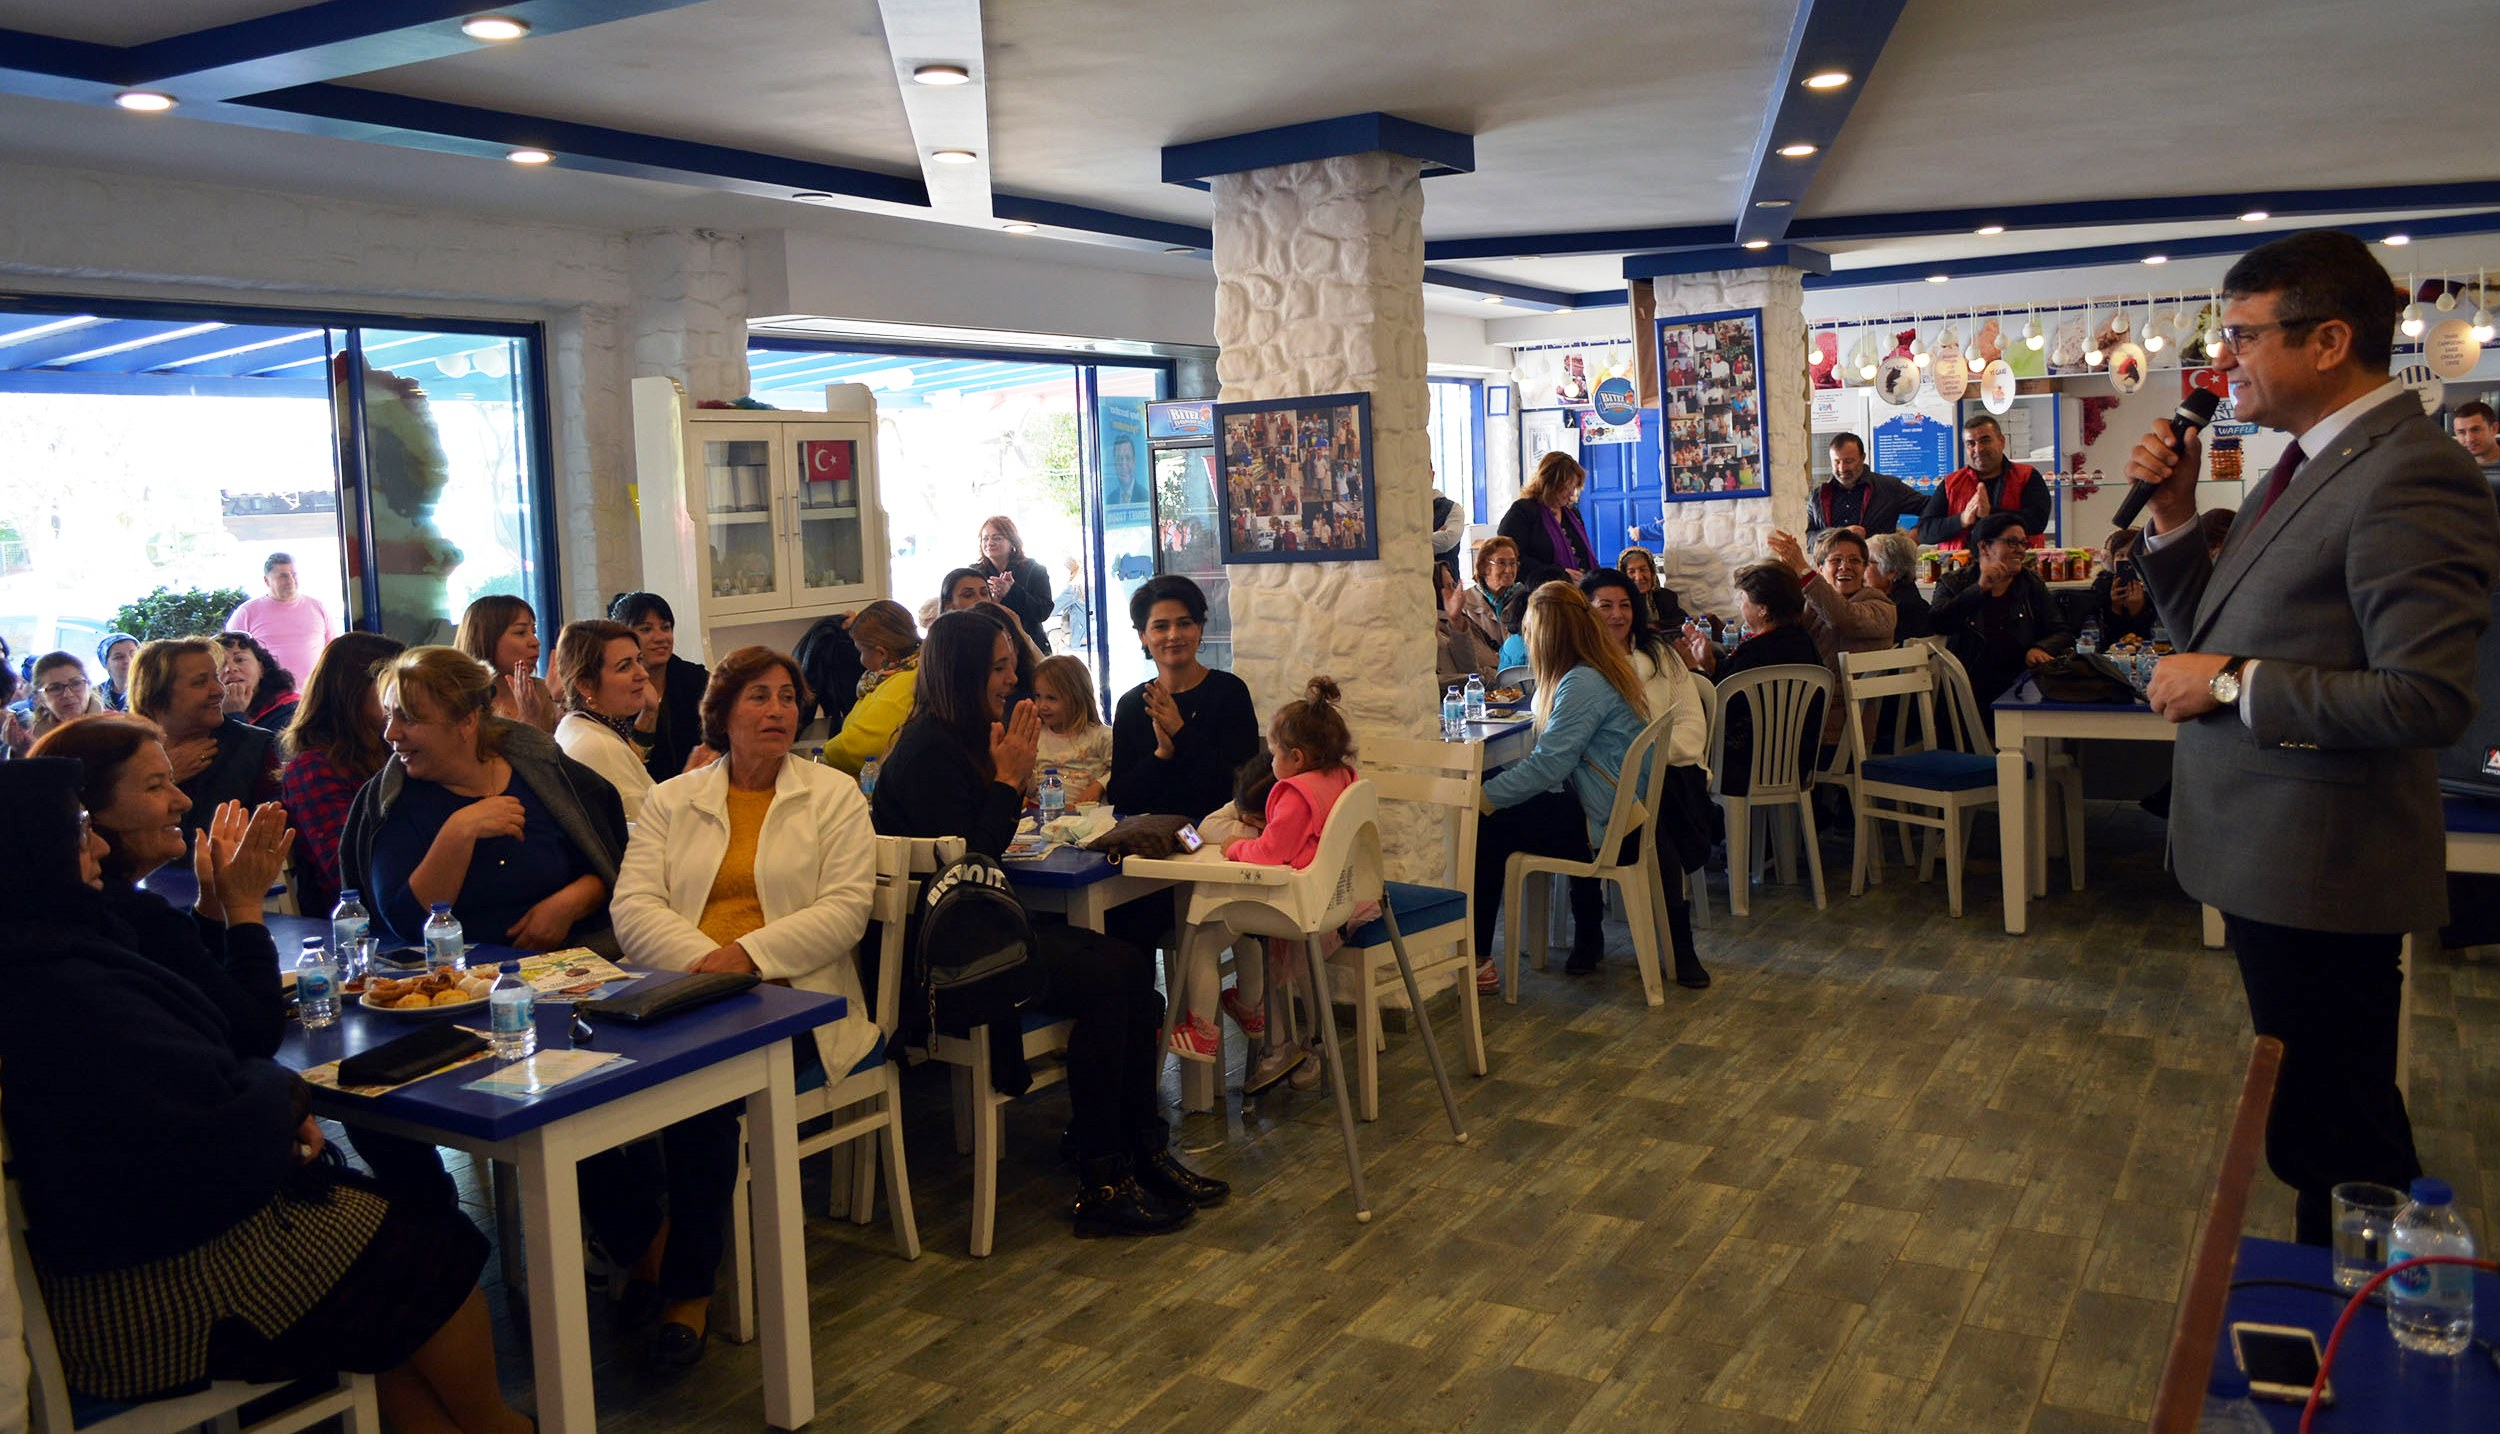 mehmet tosun MEHMET TOSUN: BİTEZ'E DE İYİ GELECEĞİZ… mehmet tosun bitez saha calismasi 4